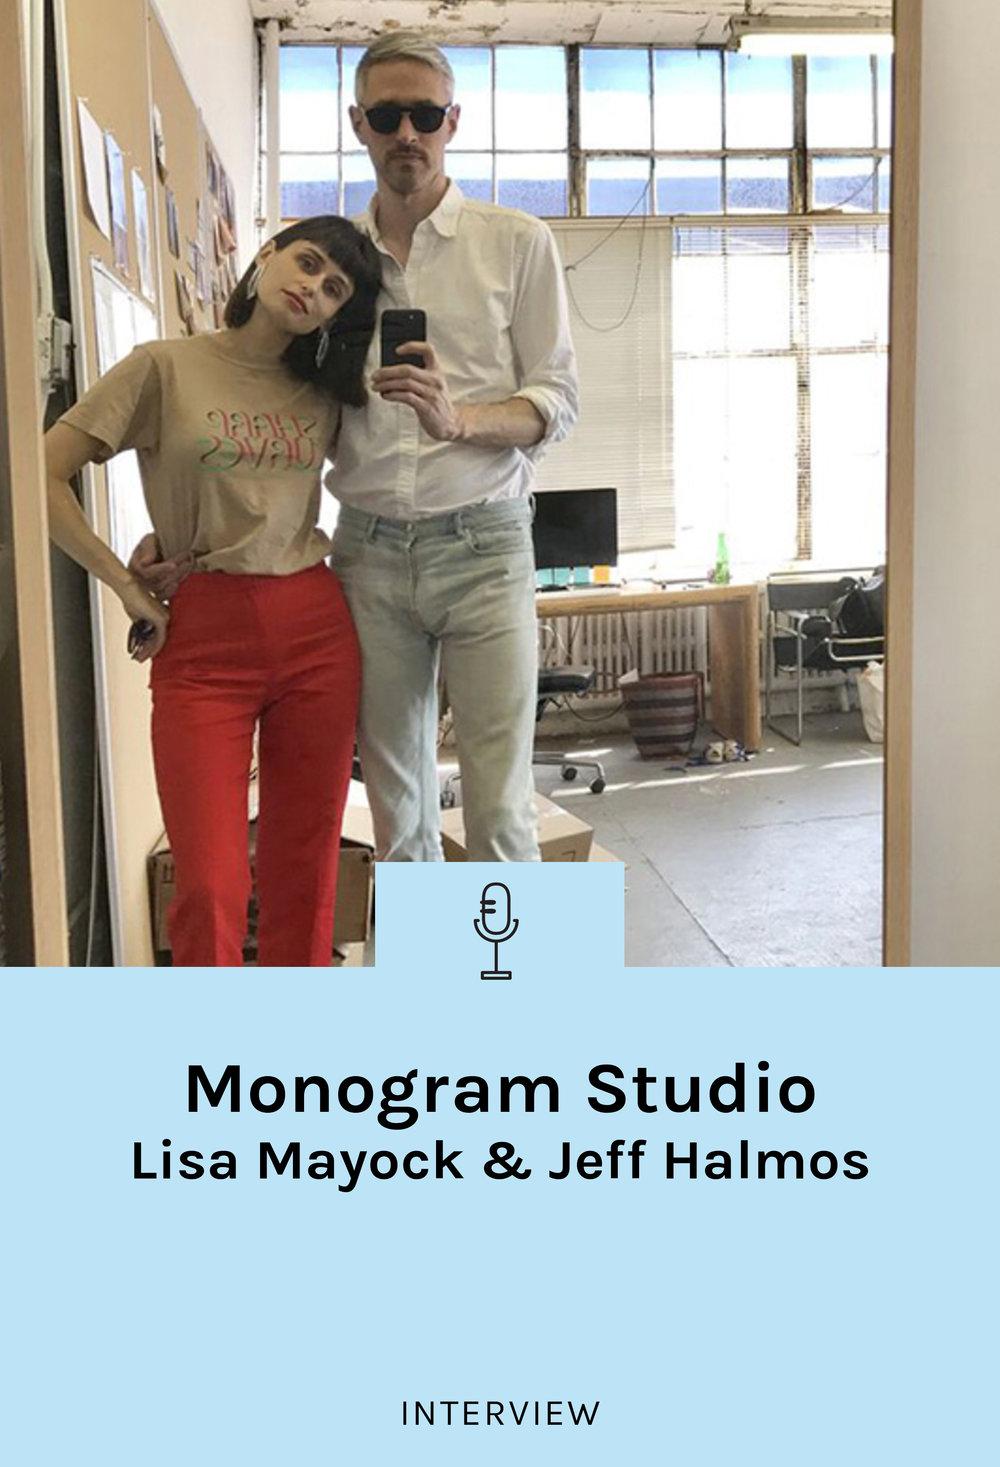 lisa-says-gah-interview-monogram